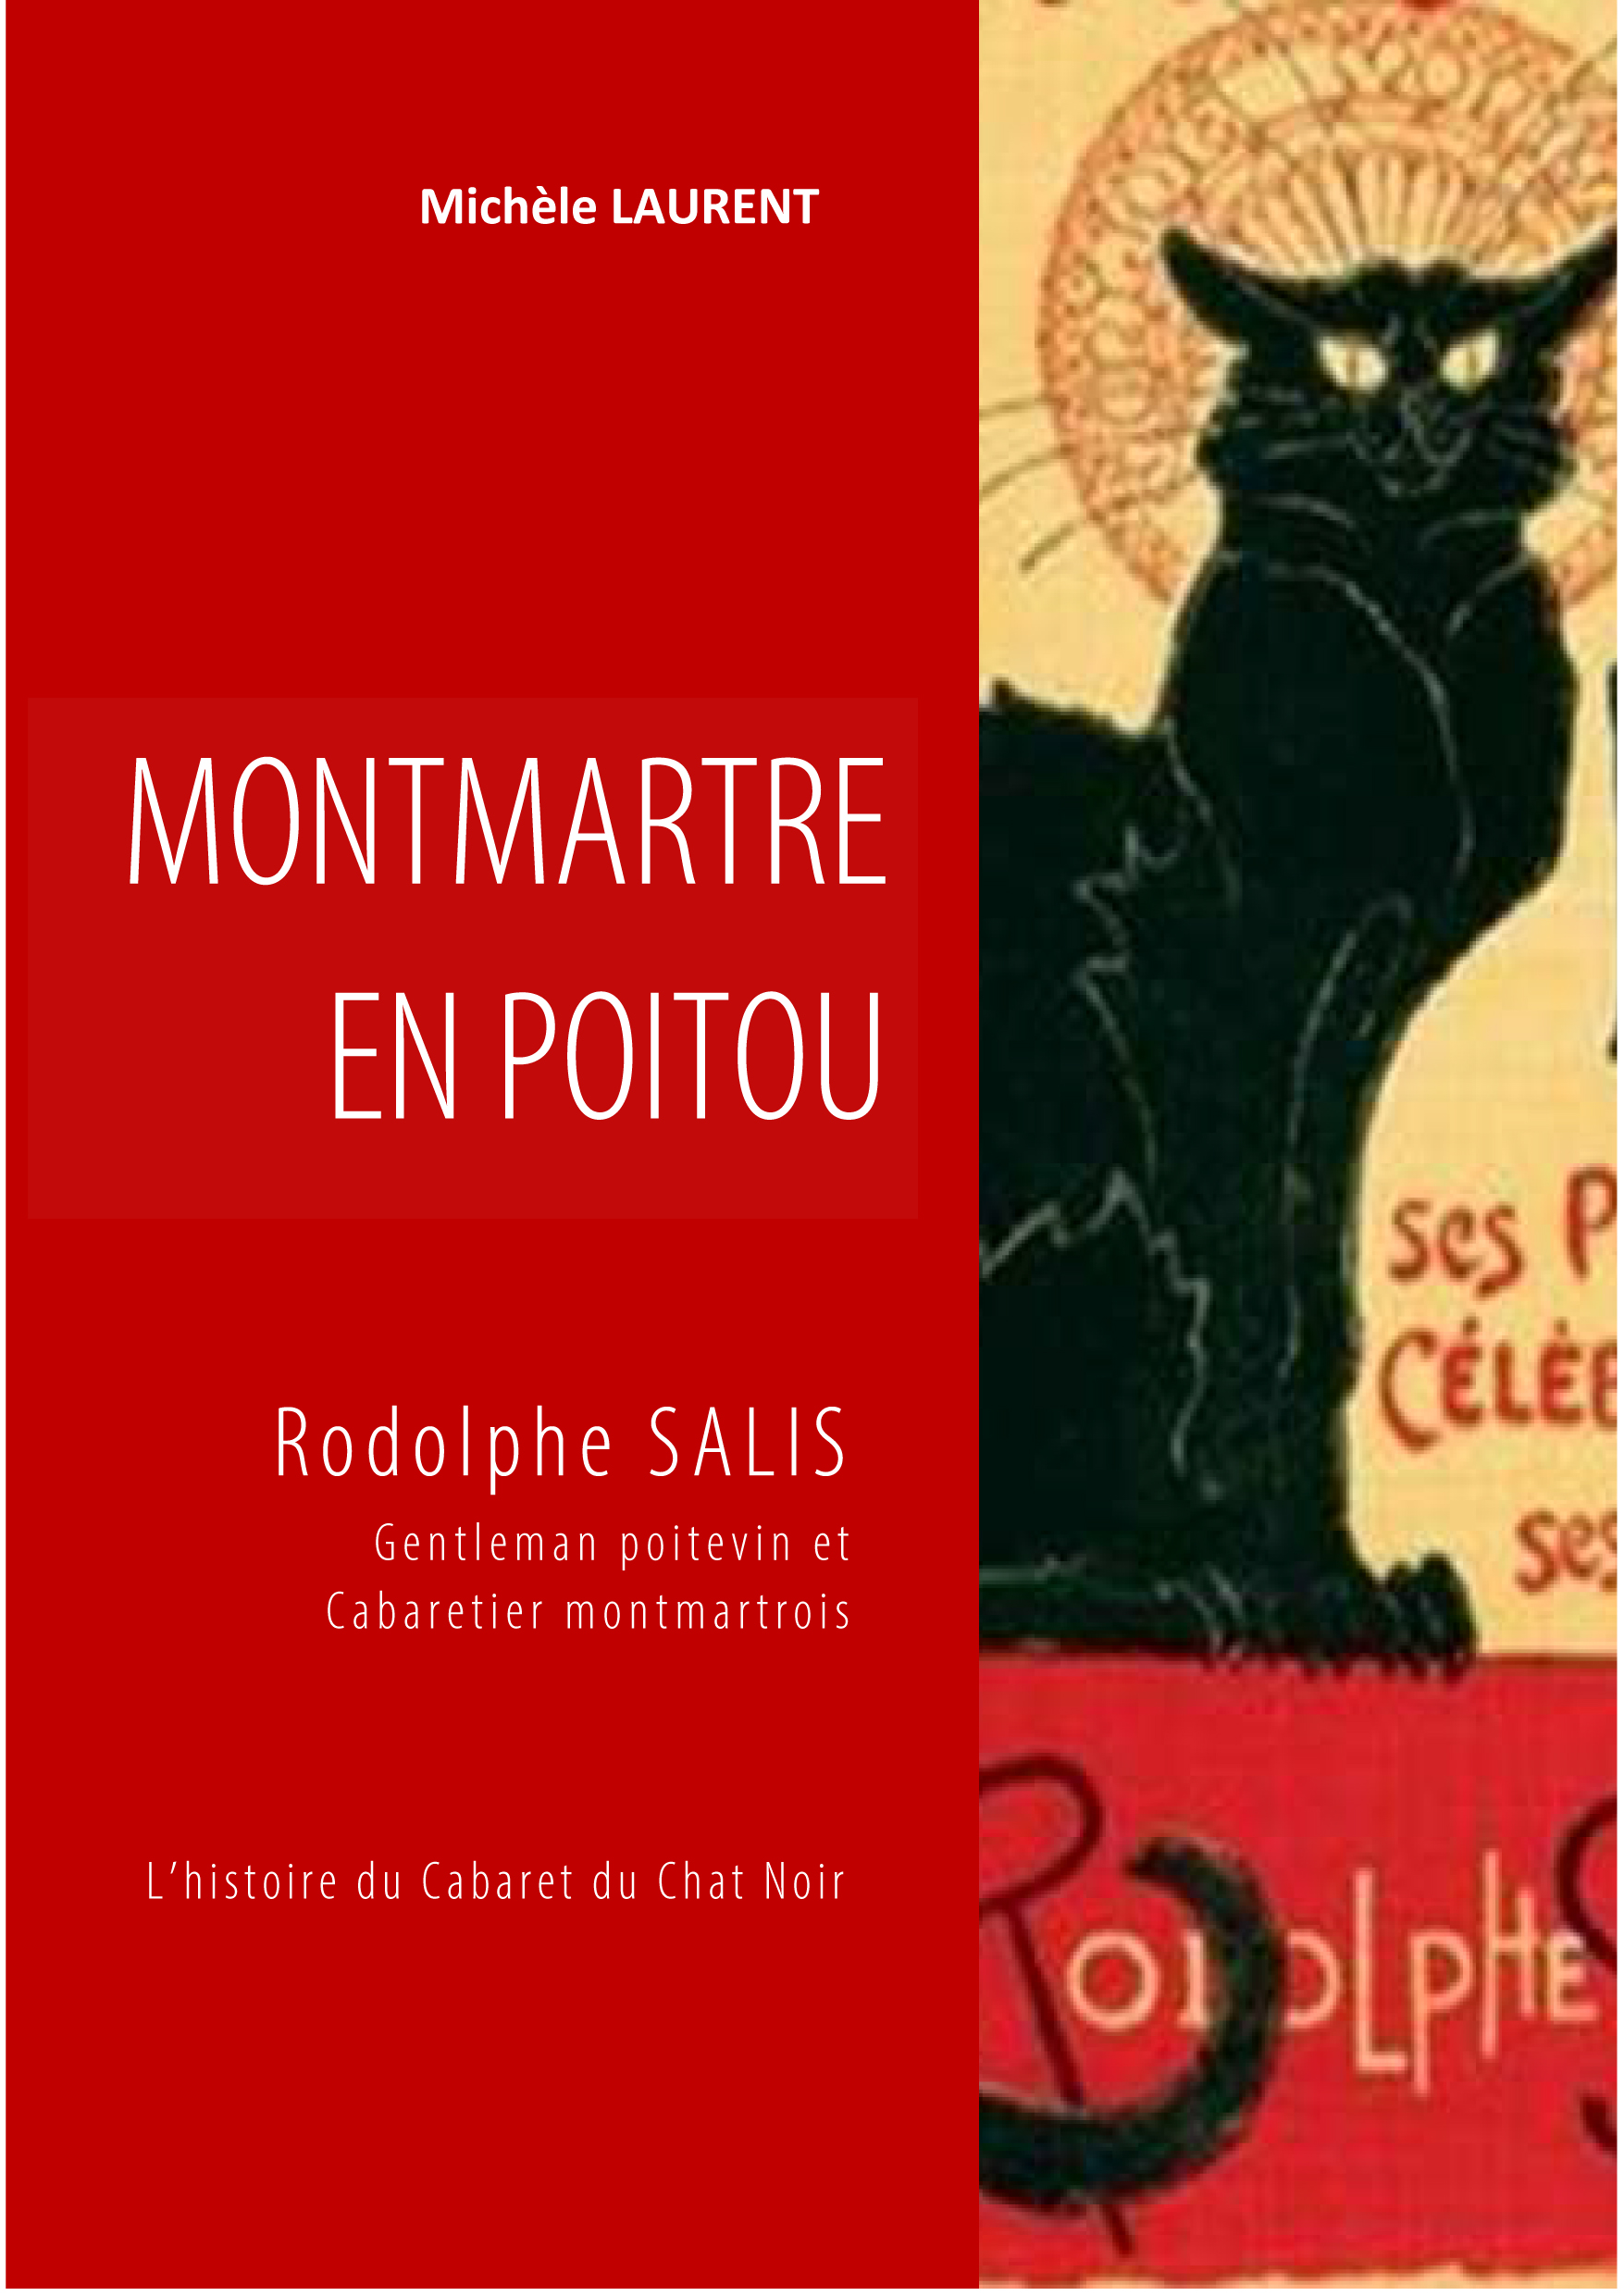 Montmartre en Poitou